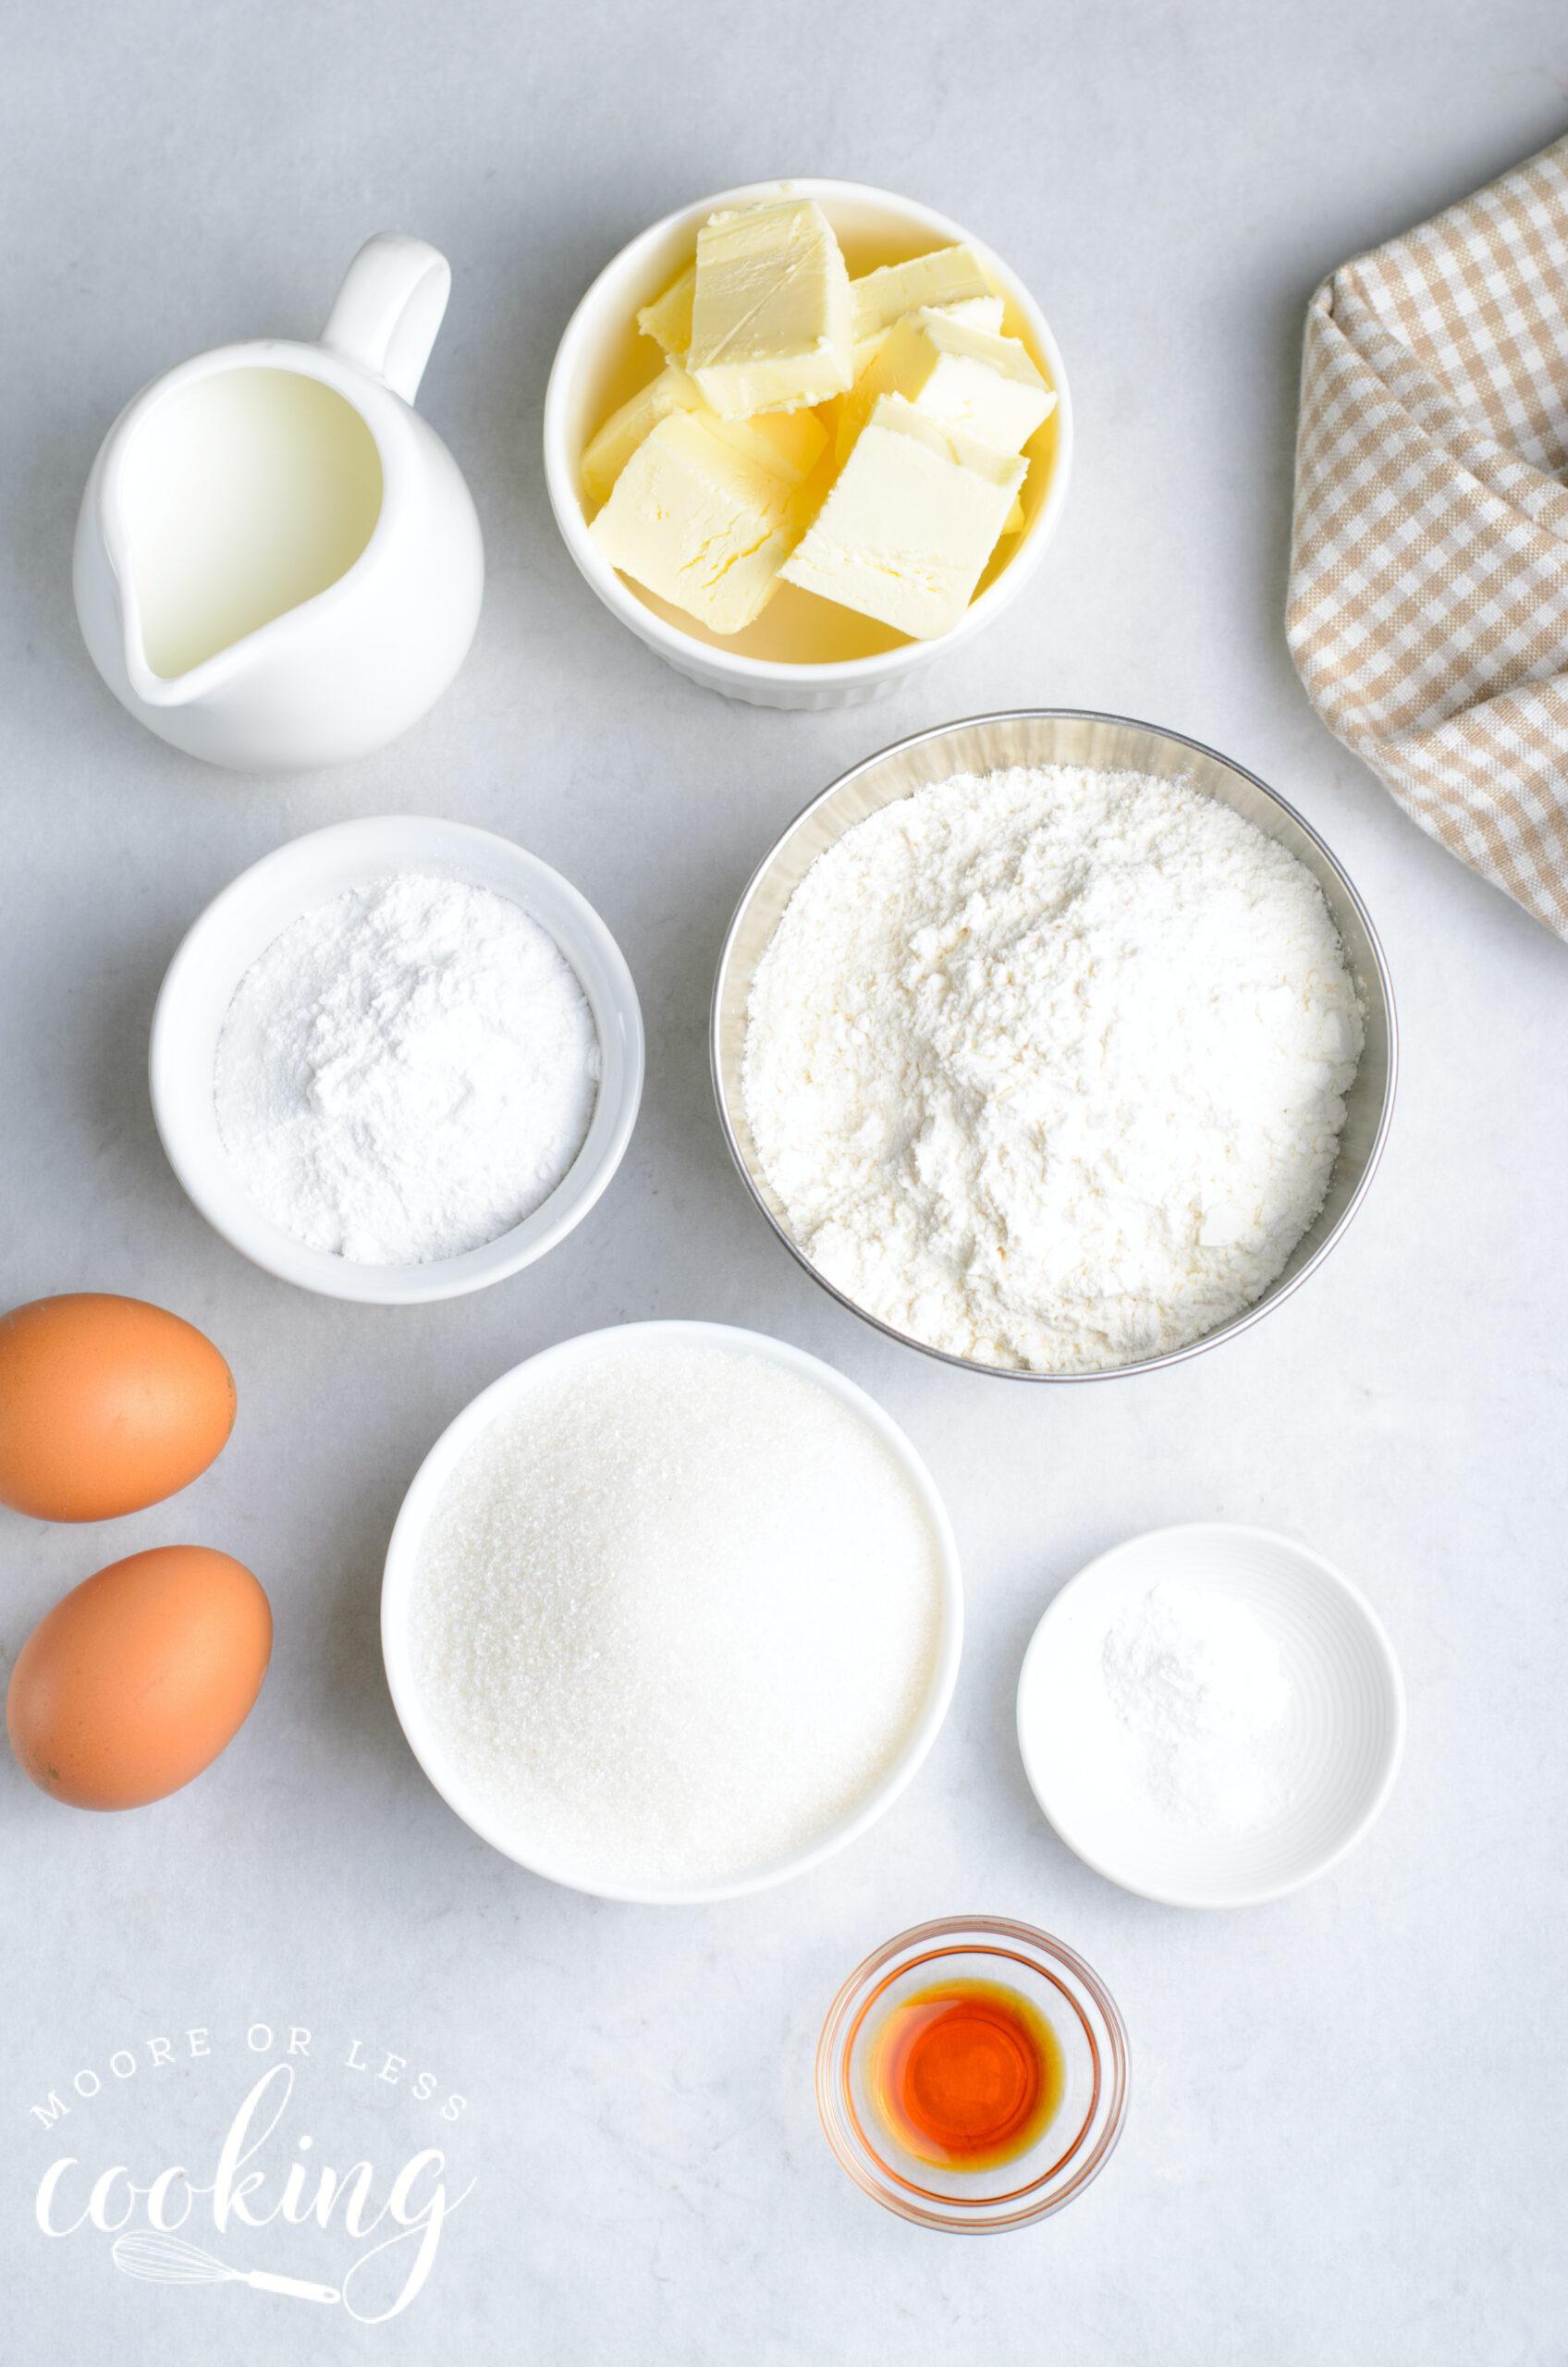 ingredients flipped